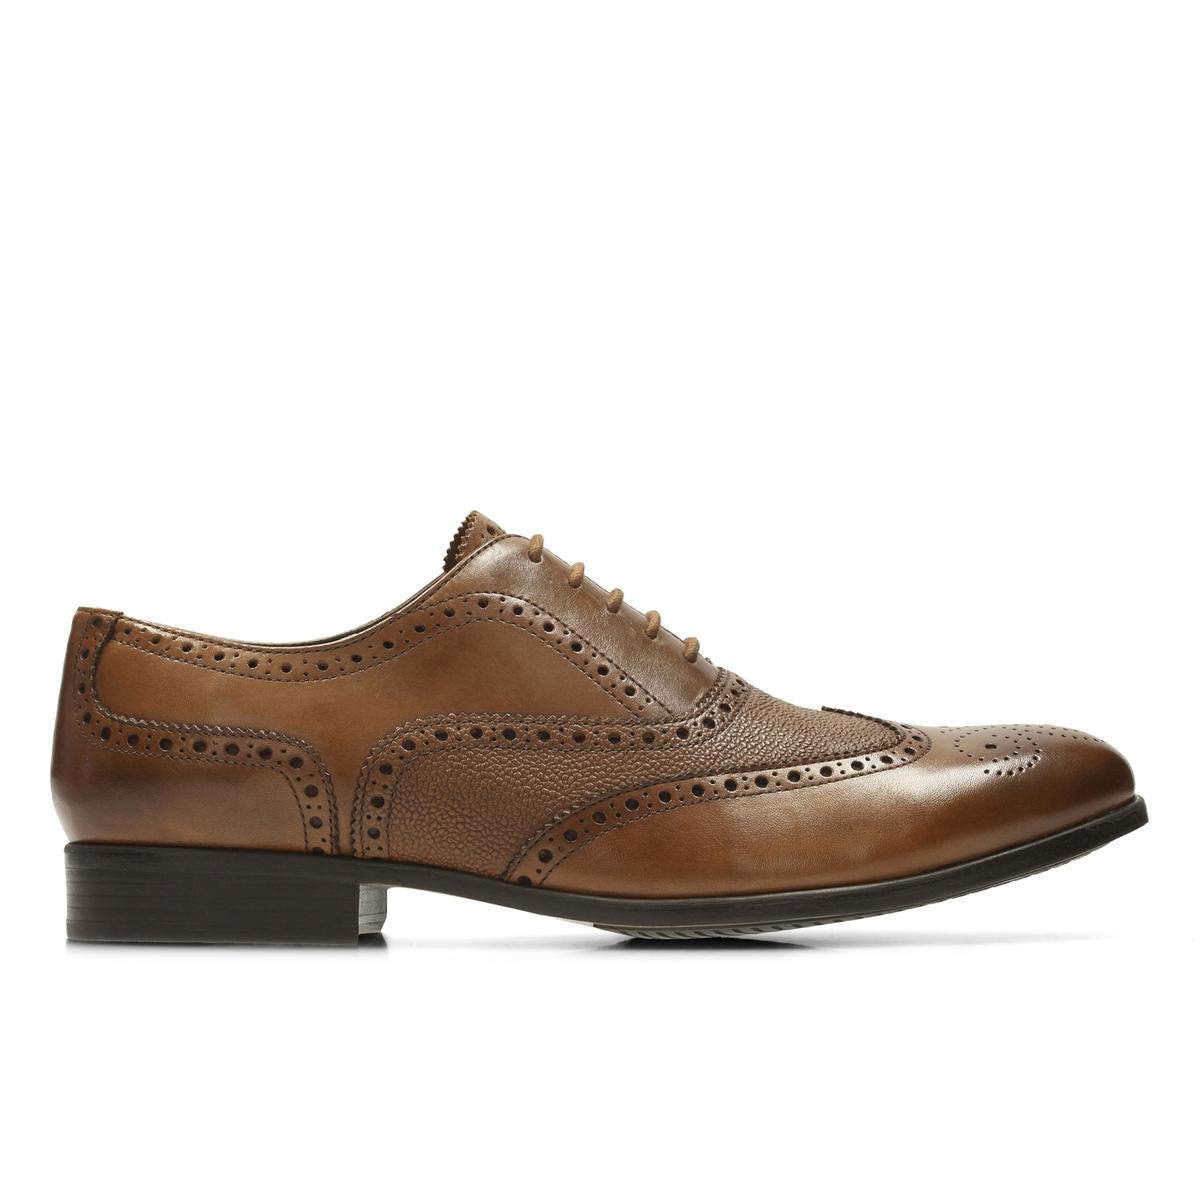 Ботинки-оксфорды кожаные Gilmore Limit limit switch zcmd21c12 zcef2